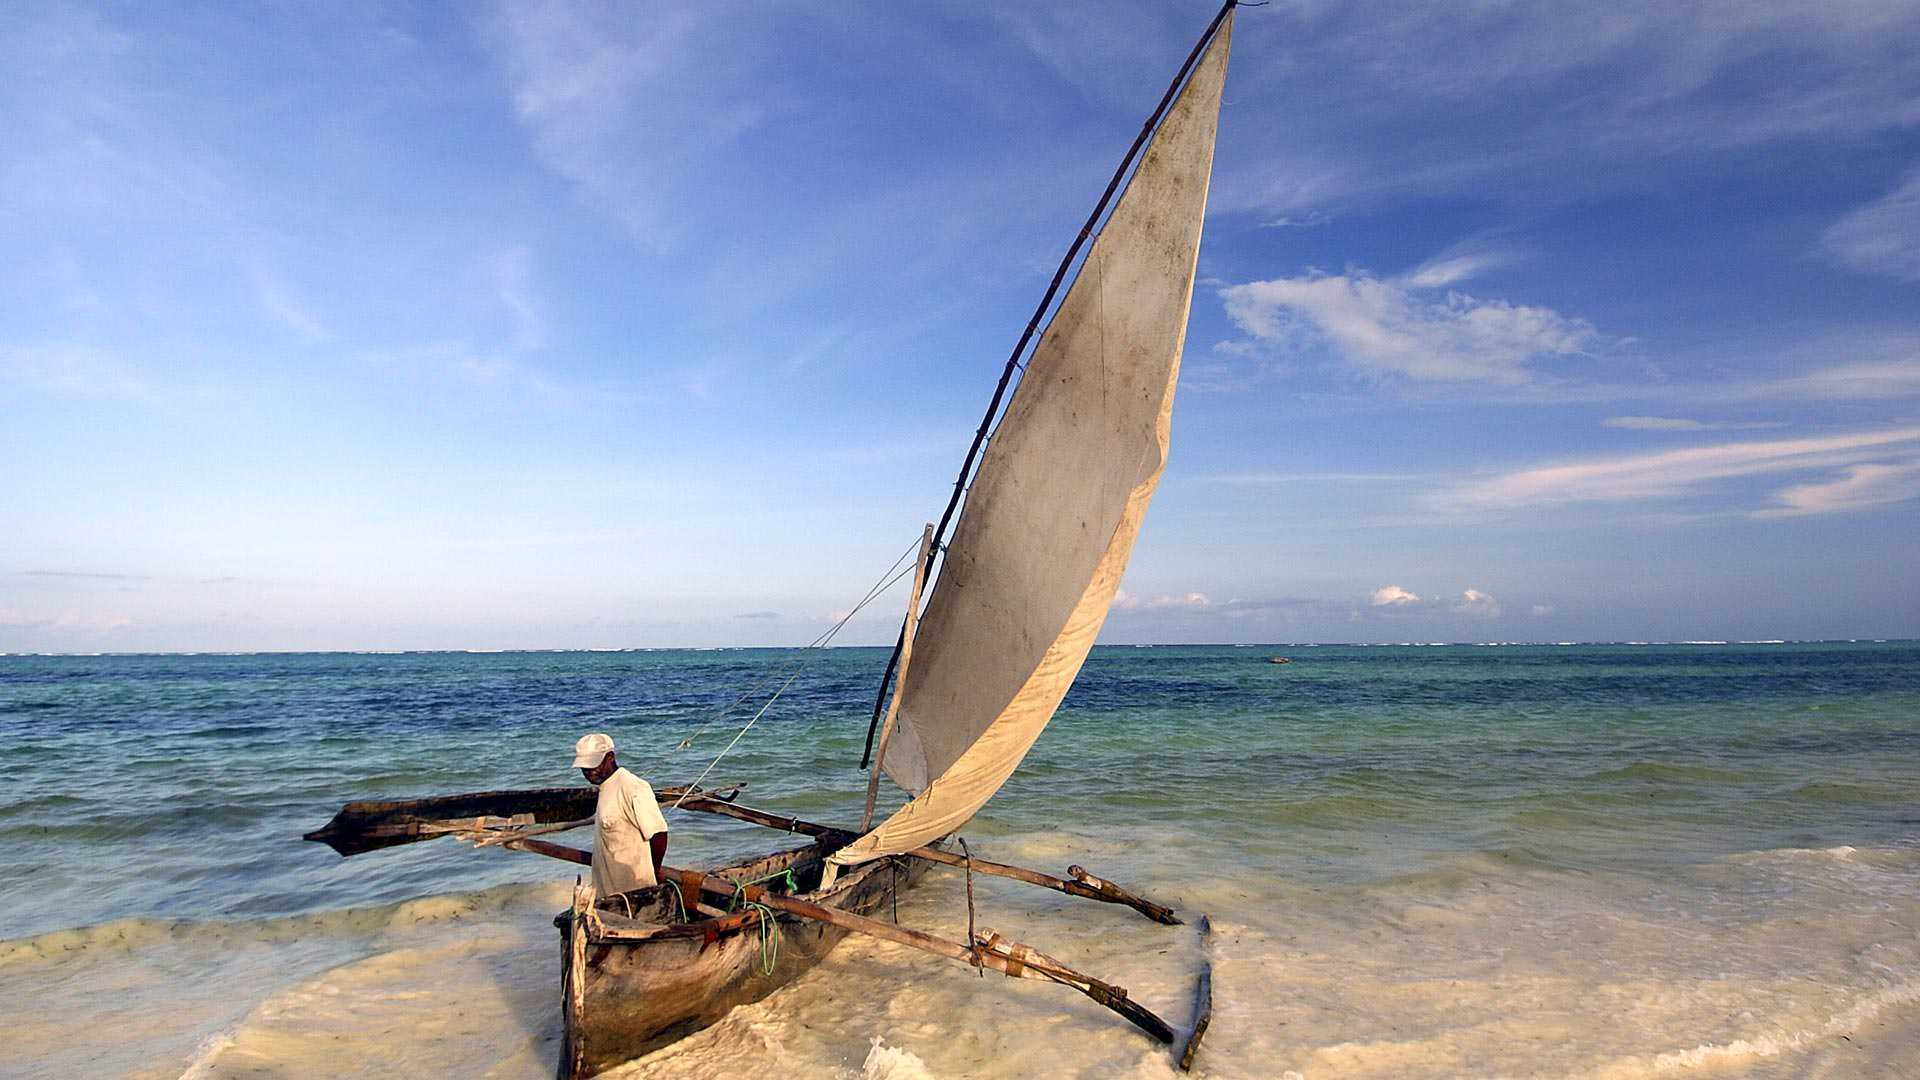 Ngalao Saling boat